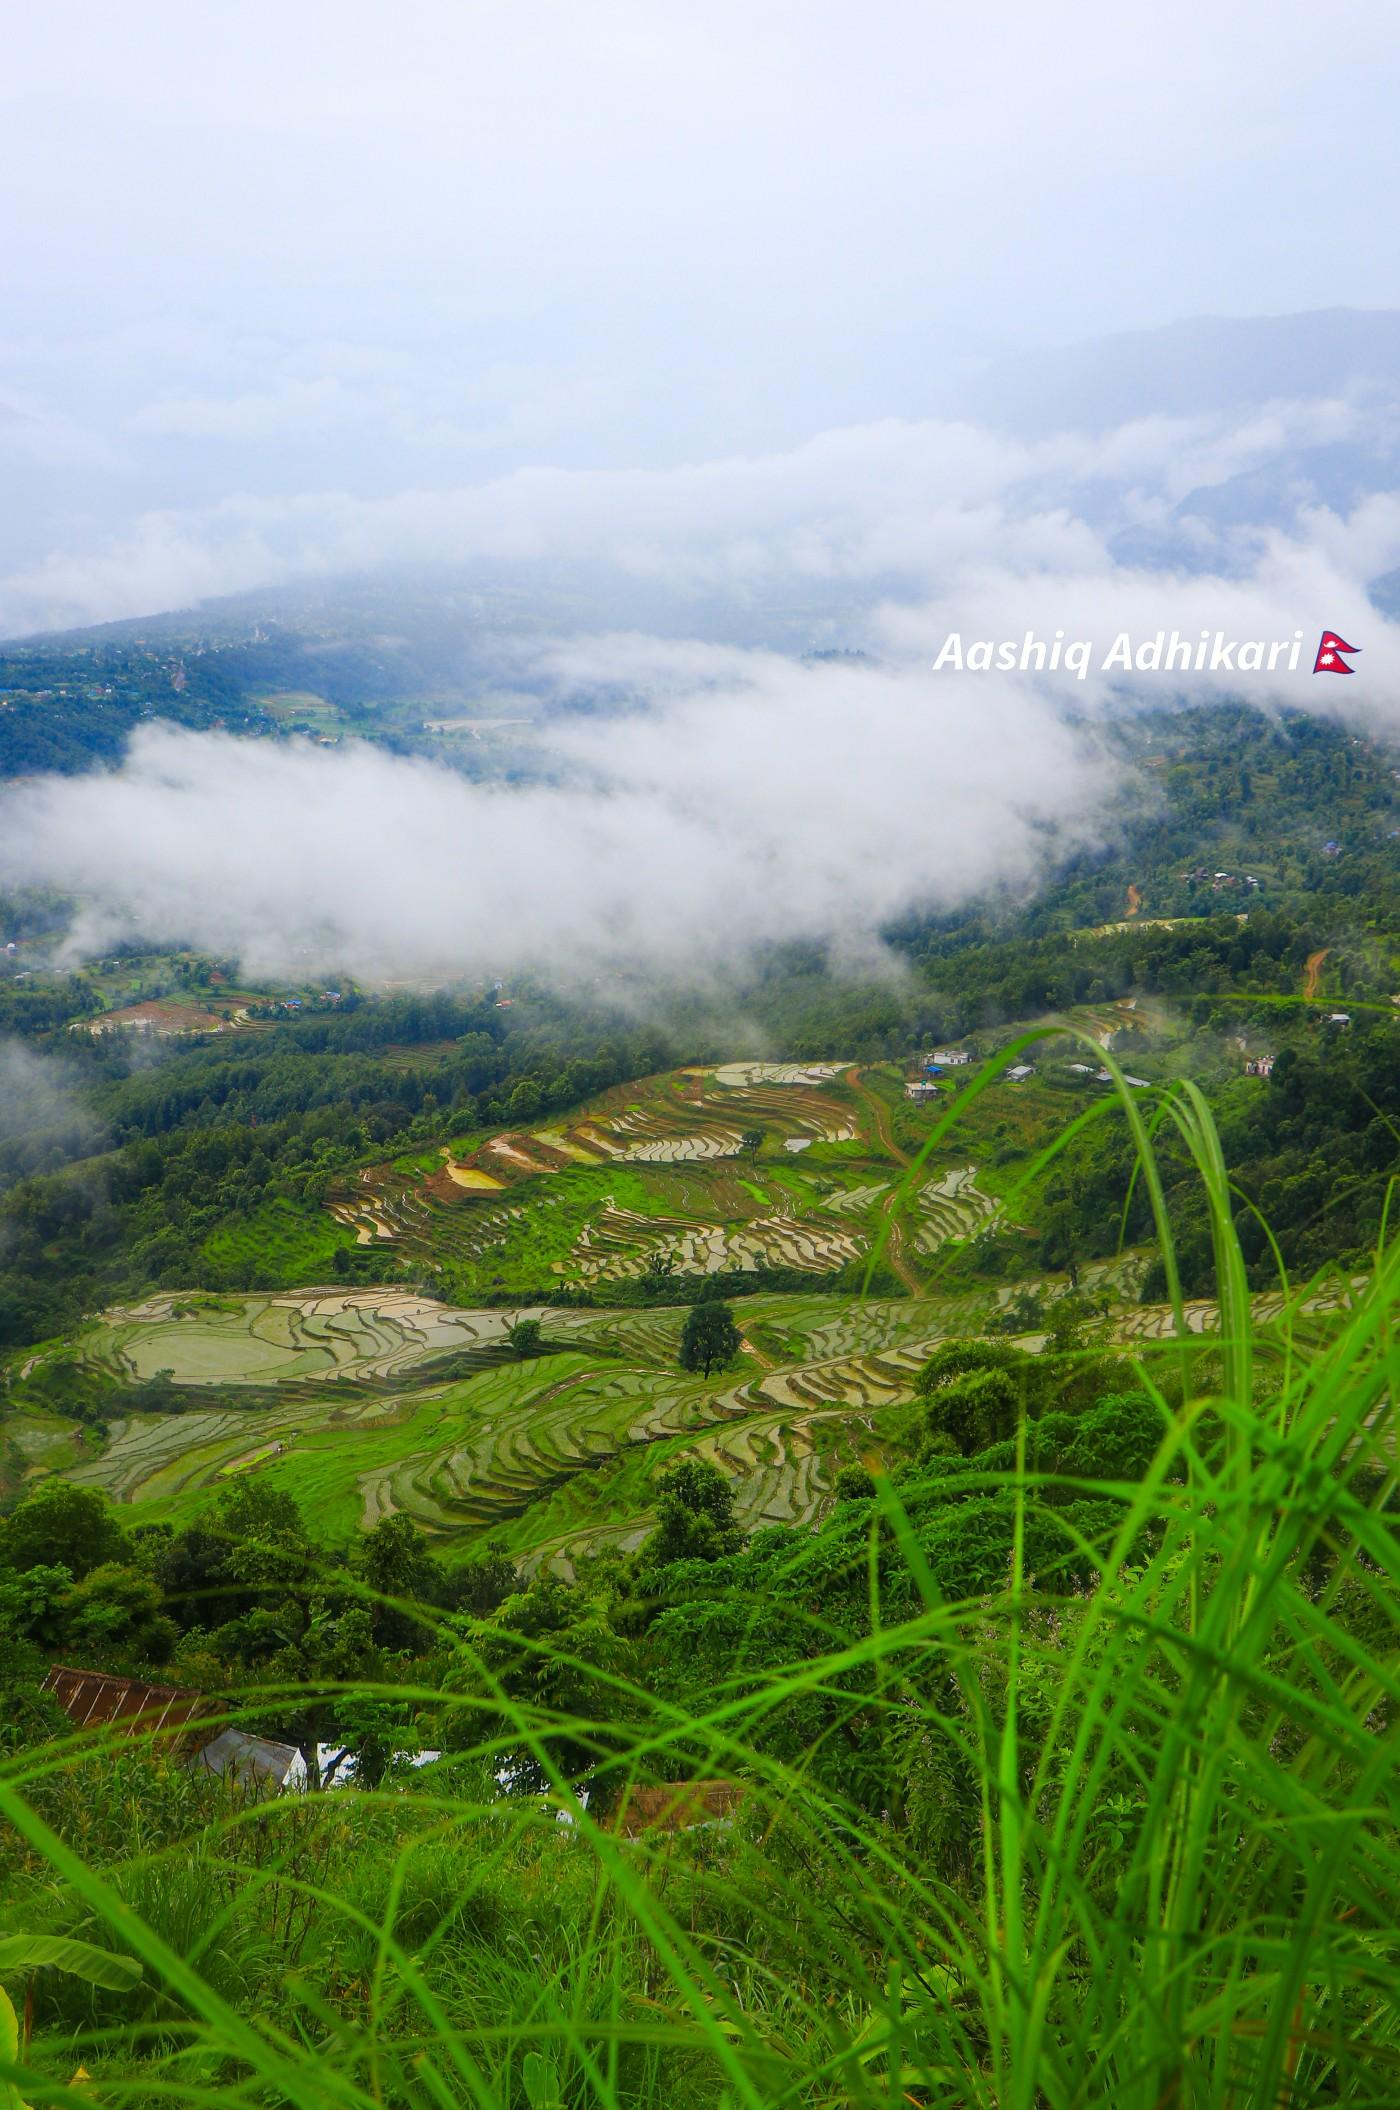 Greenary in Palungtar, Gorkha.